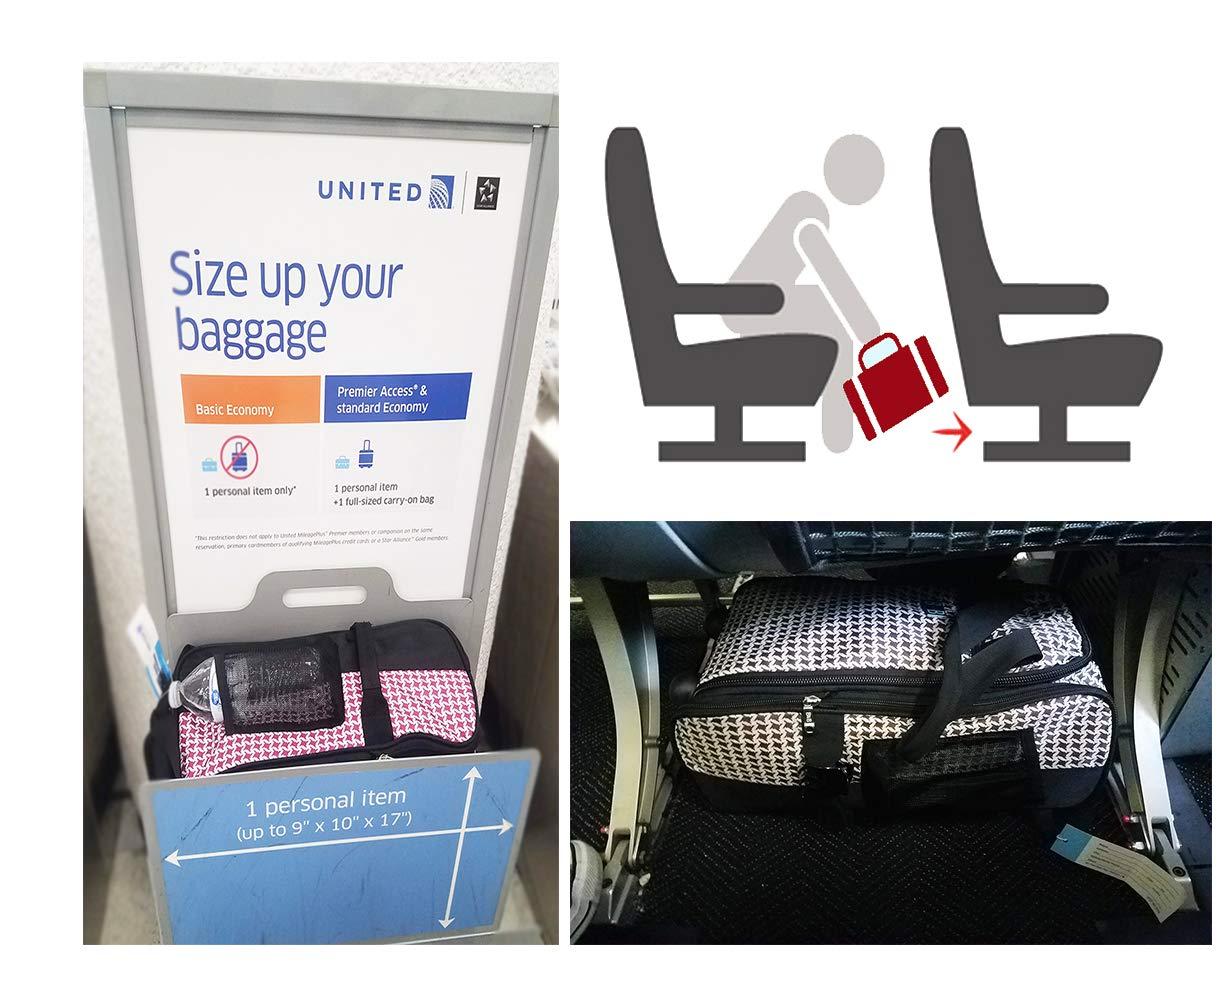 18x14x8 Bag Best Personal Item Bags For Spirit Jetblue Allegiant,Modular Kitchen Designs Catalogue 2020